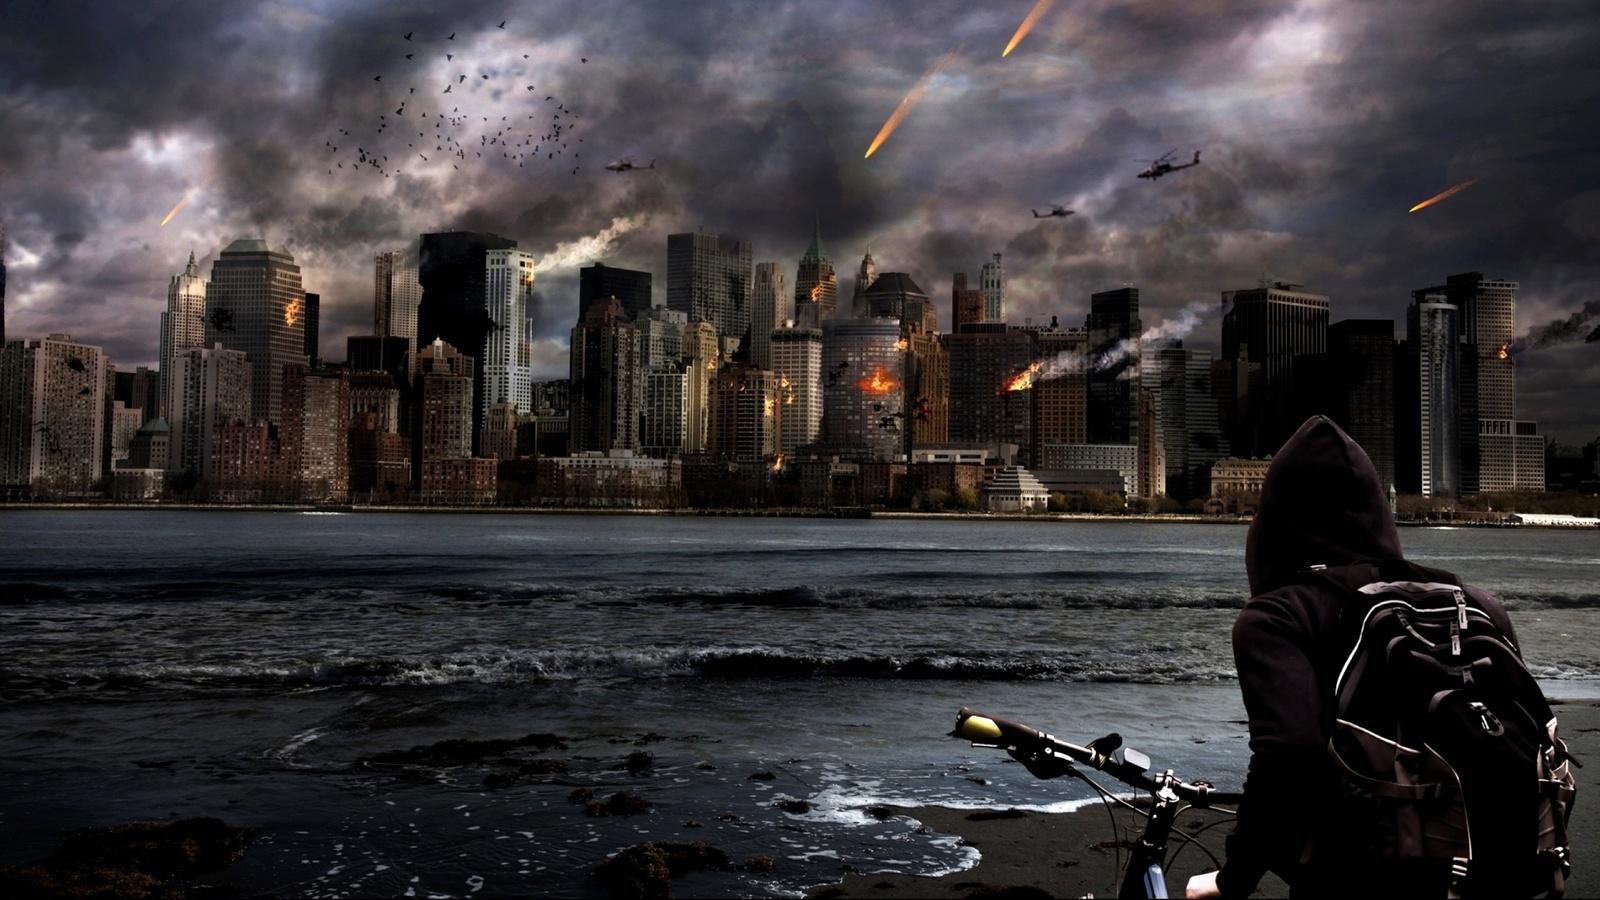 катастрофа, метеориты